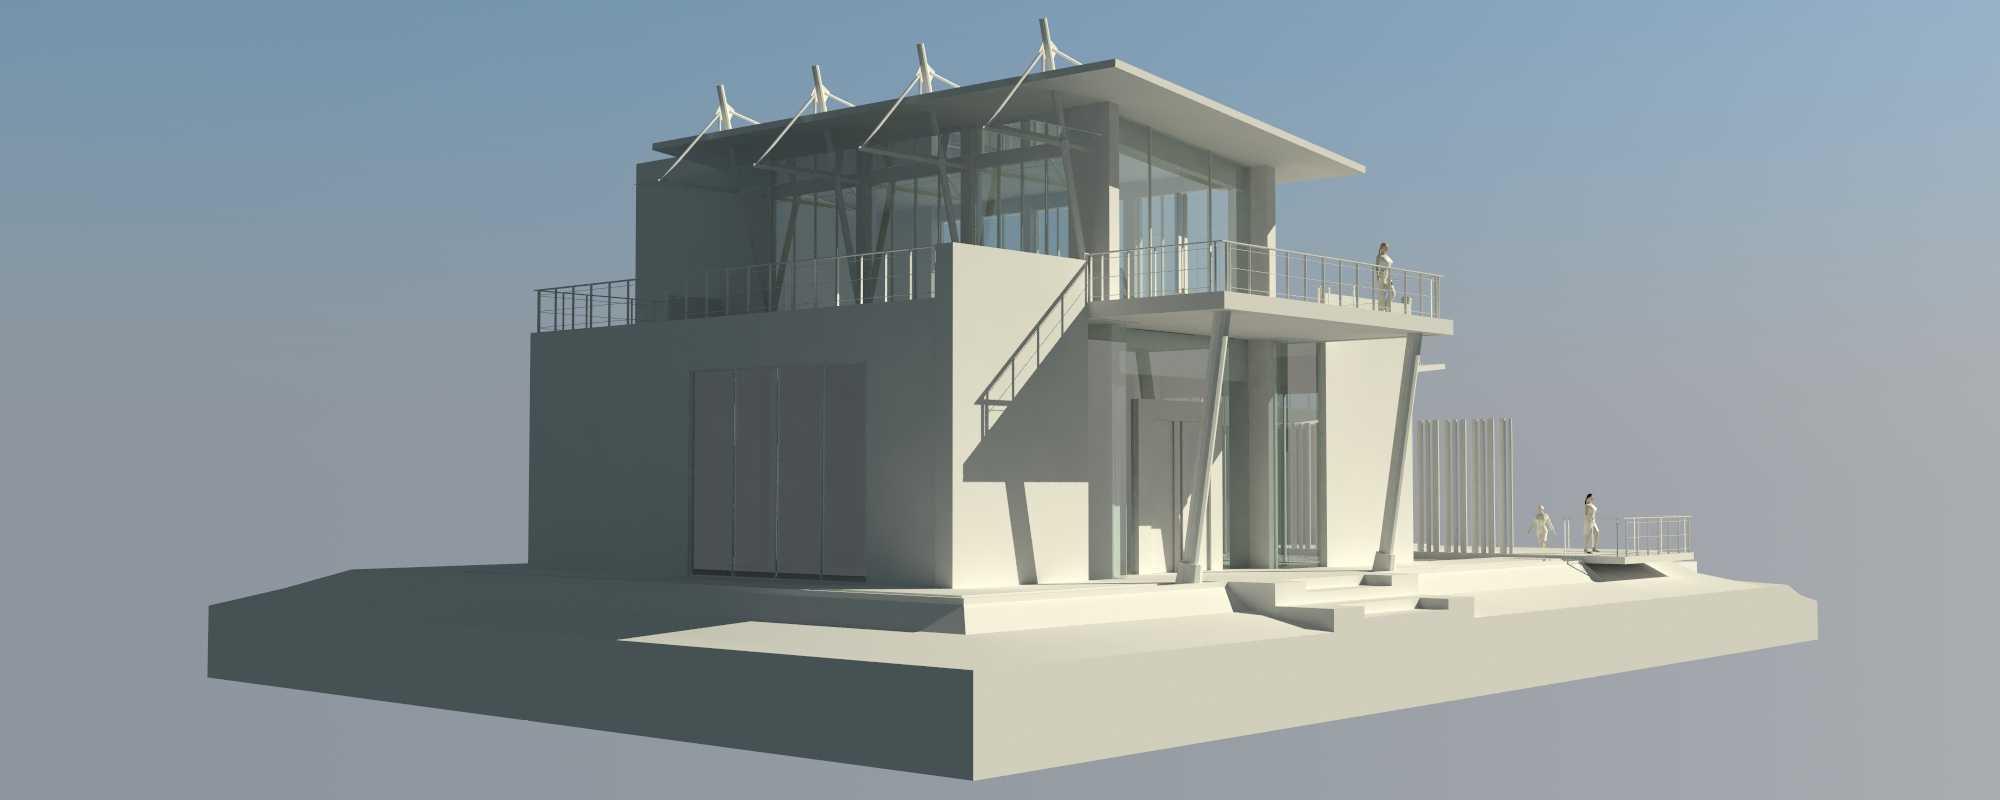 Budi Dharma Office Villa At Sukabumi Jawa Barat Jawa Barat Perspektive-02   24473